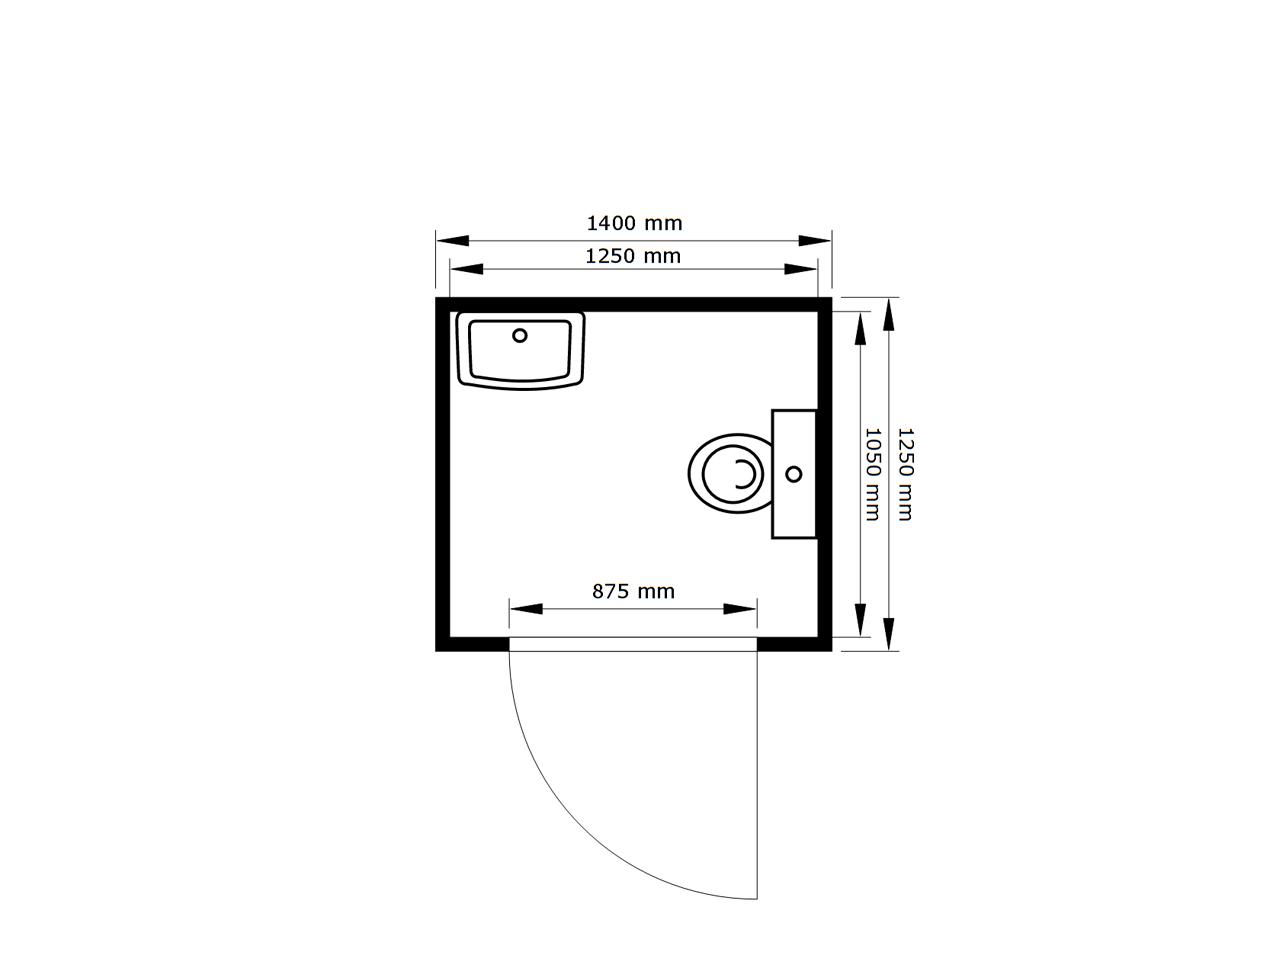 fladafi containerbau tb 2701 container kaufen. Black Bedroom Furniture Sets. Home Design Ideas